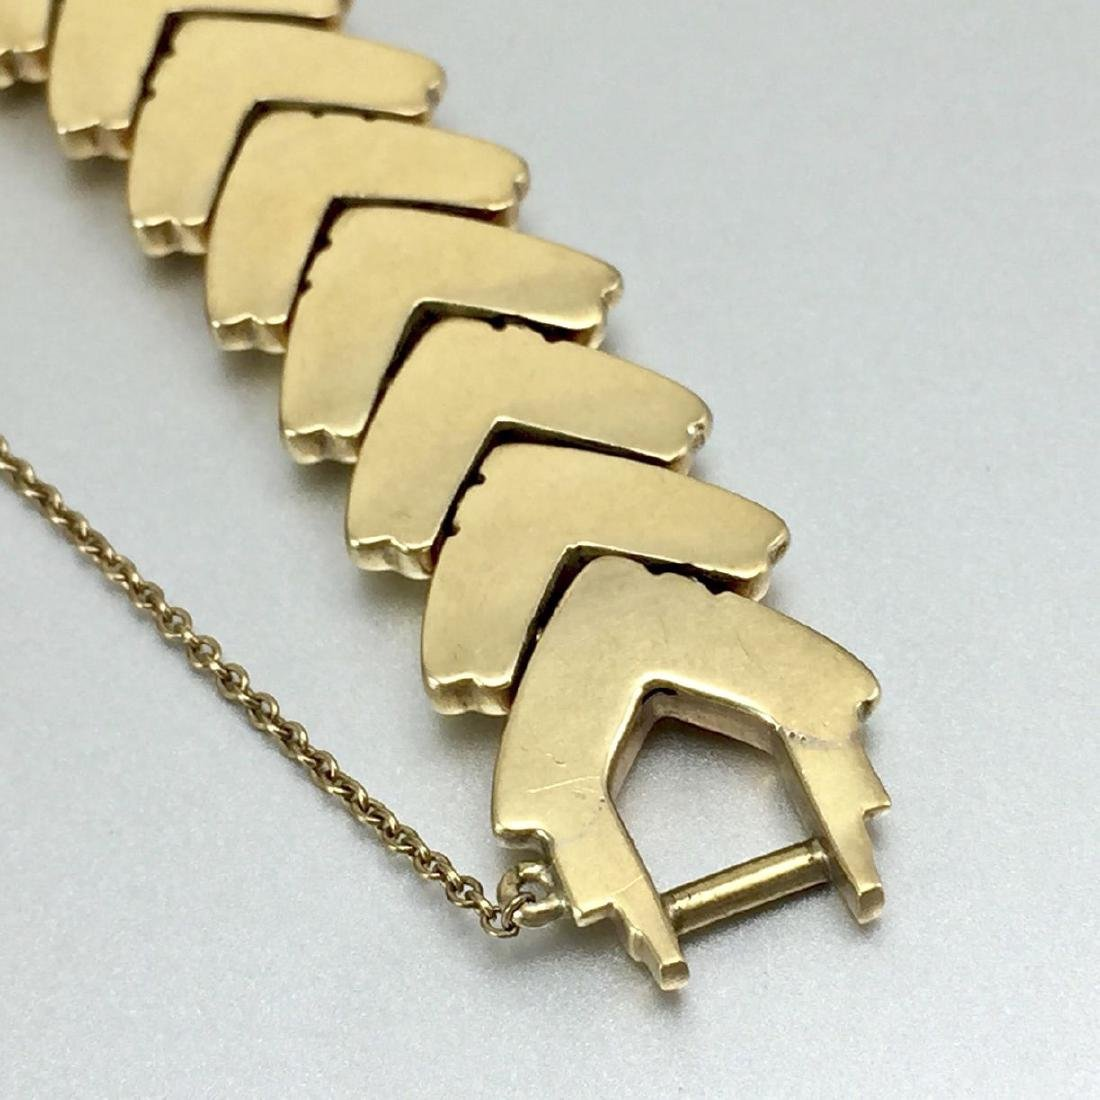 14k Herringbone Style Solid Gold Bracelet - 10